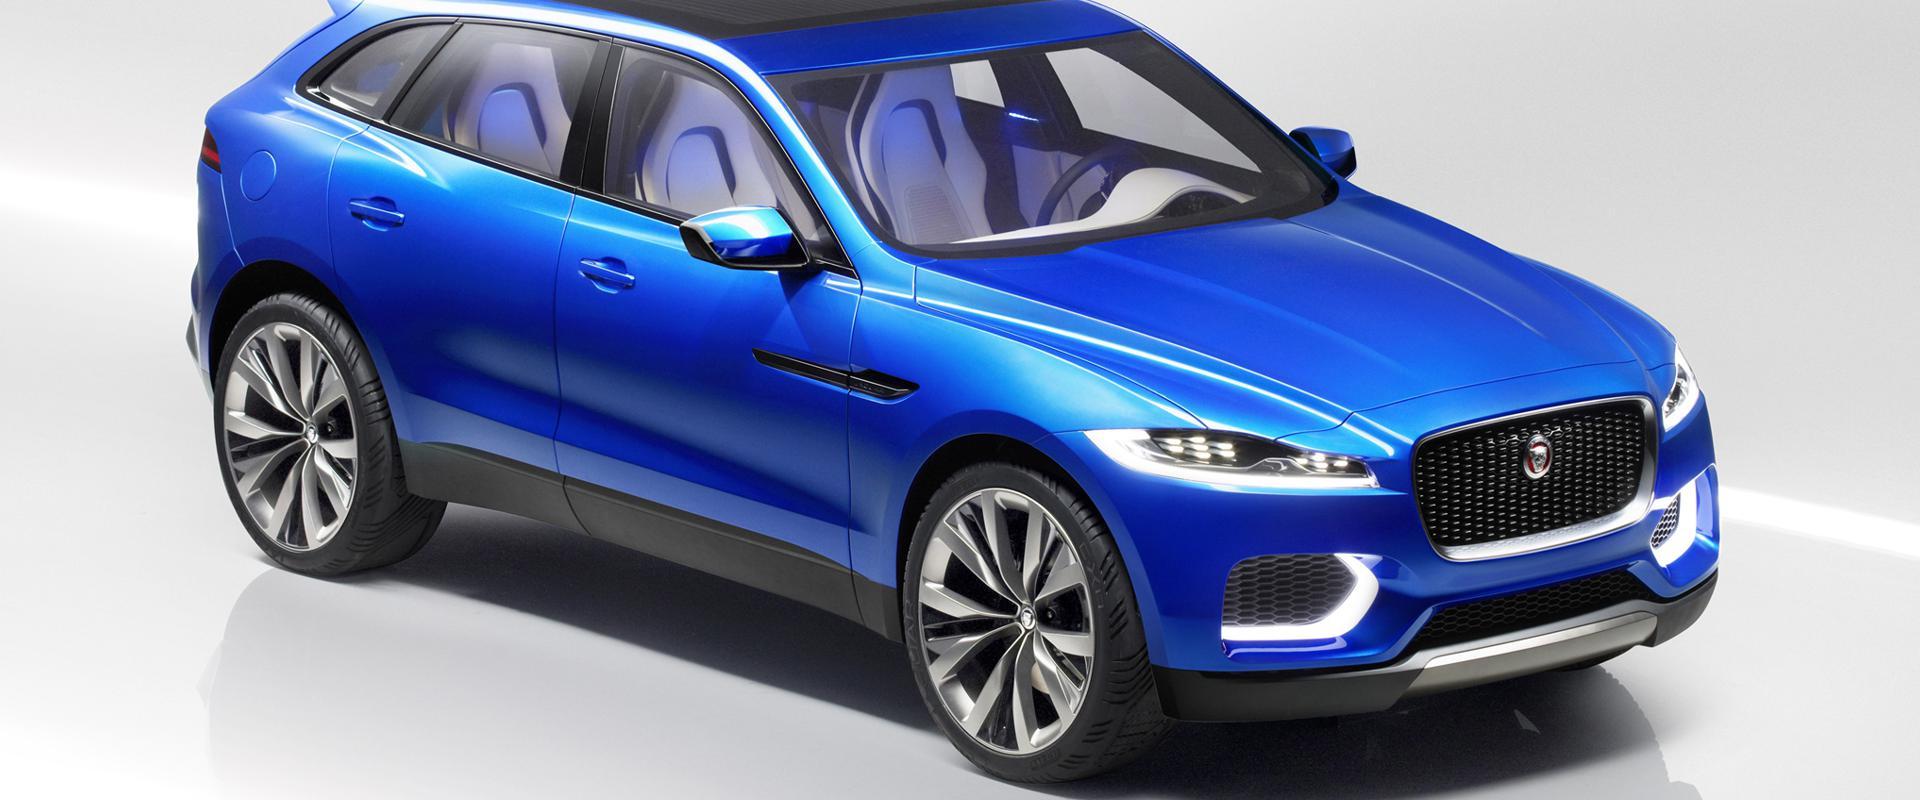 Prvi Jaguarov crossover spreman za Frankfurt